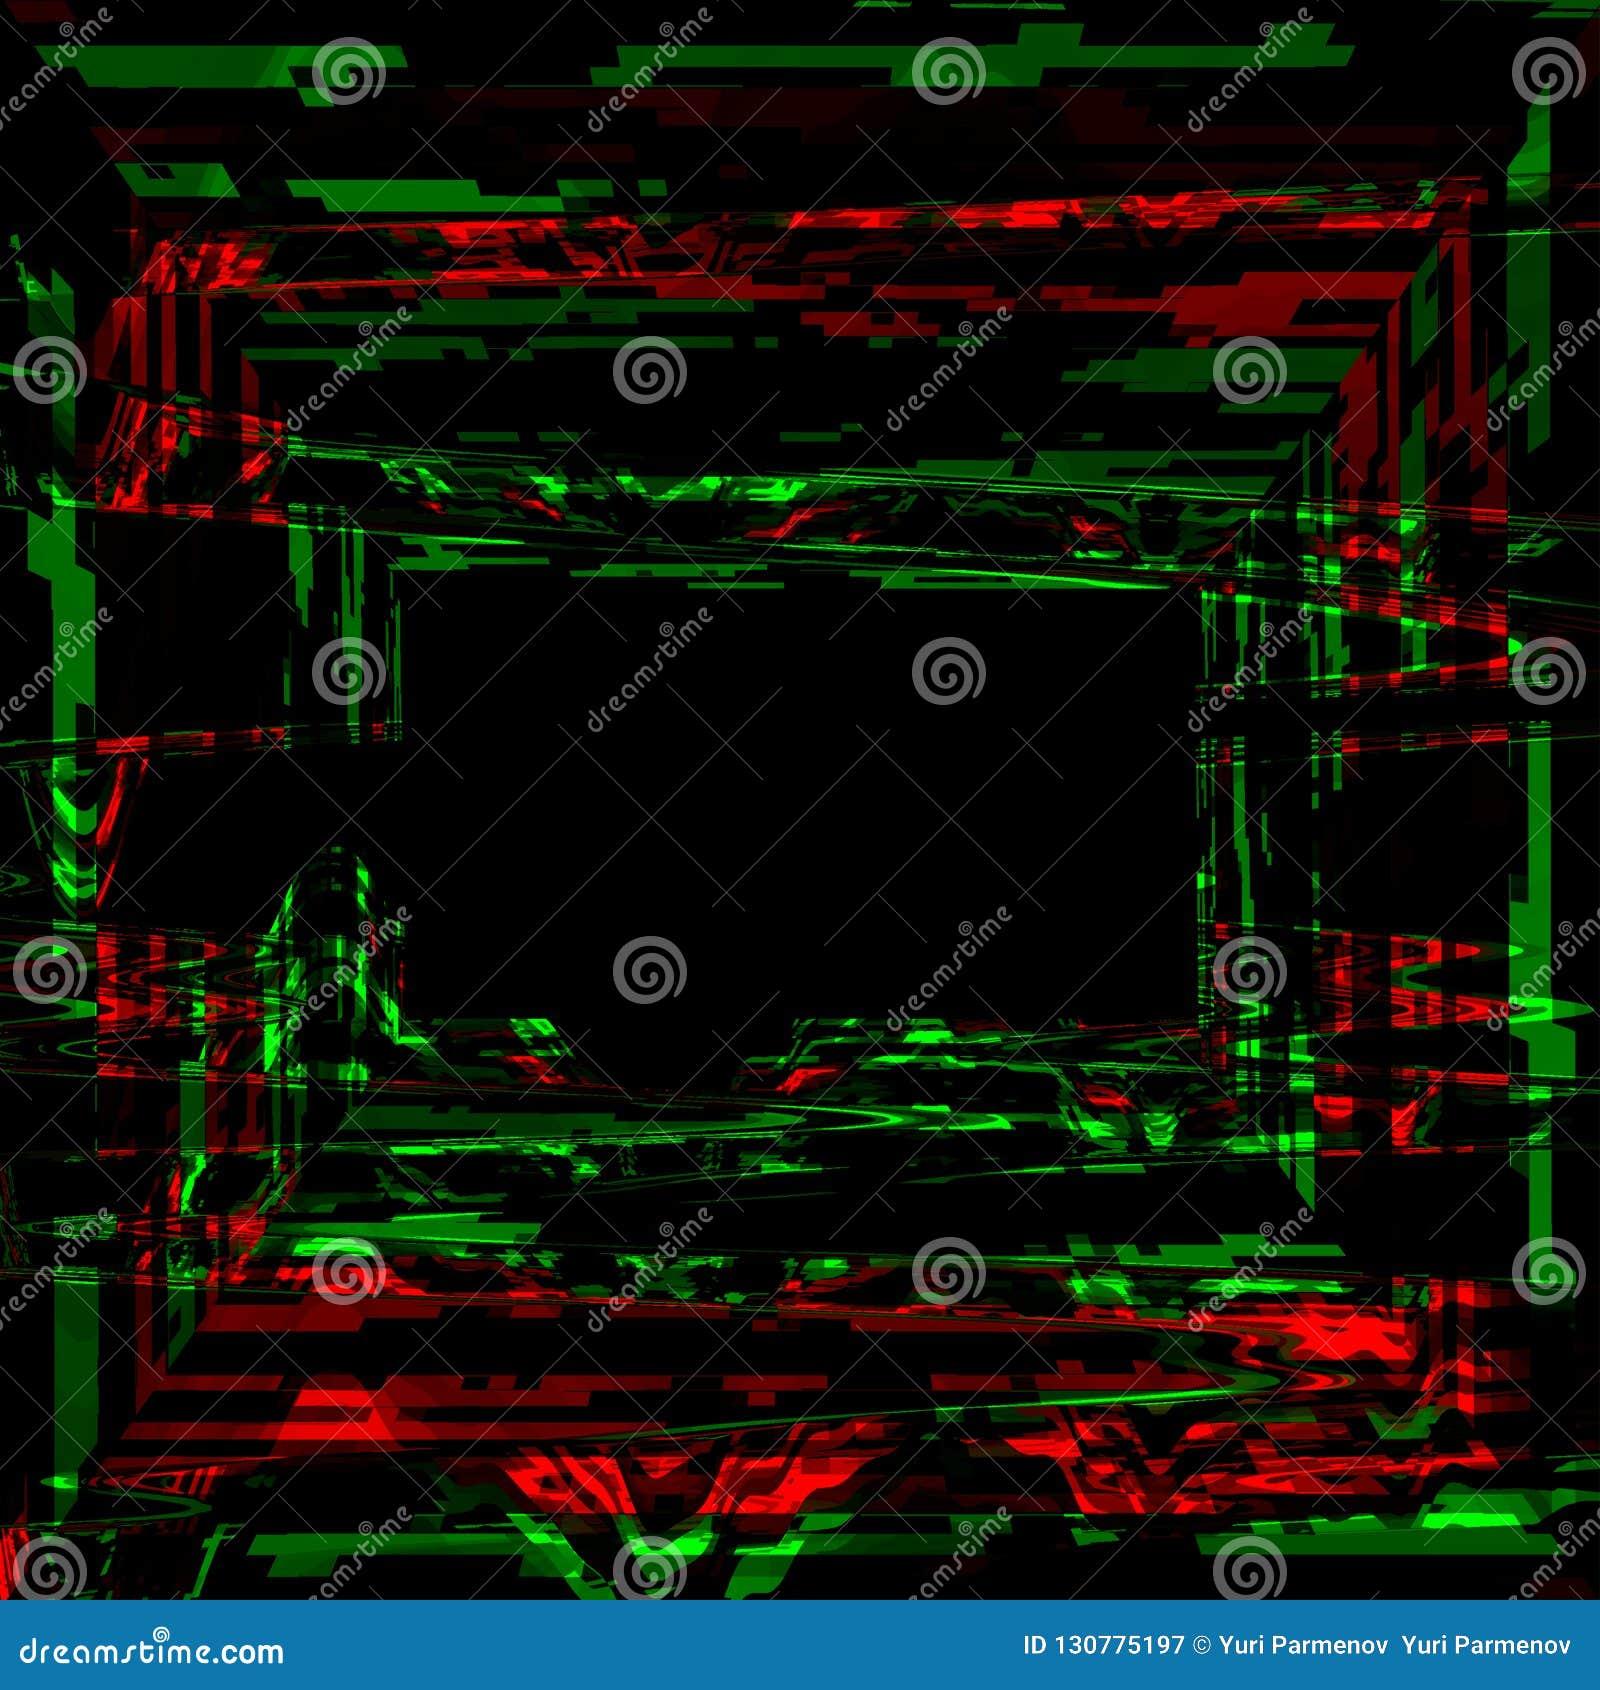 Superb Glitch Psychedelic Background Cyber Room Digital Pixel Download Free Architecture Designs Scobabritishbridgeorg